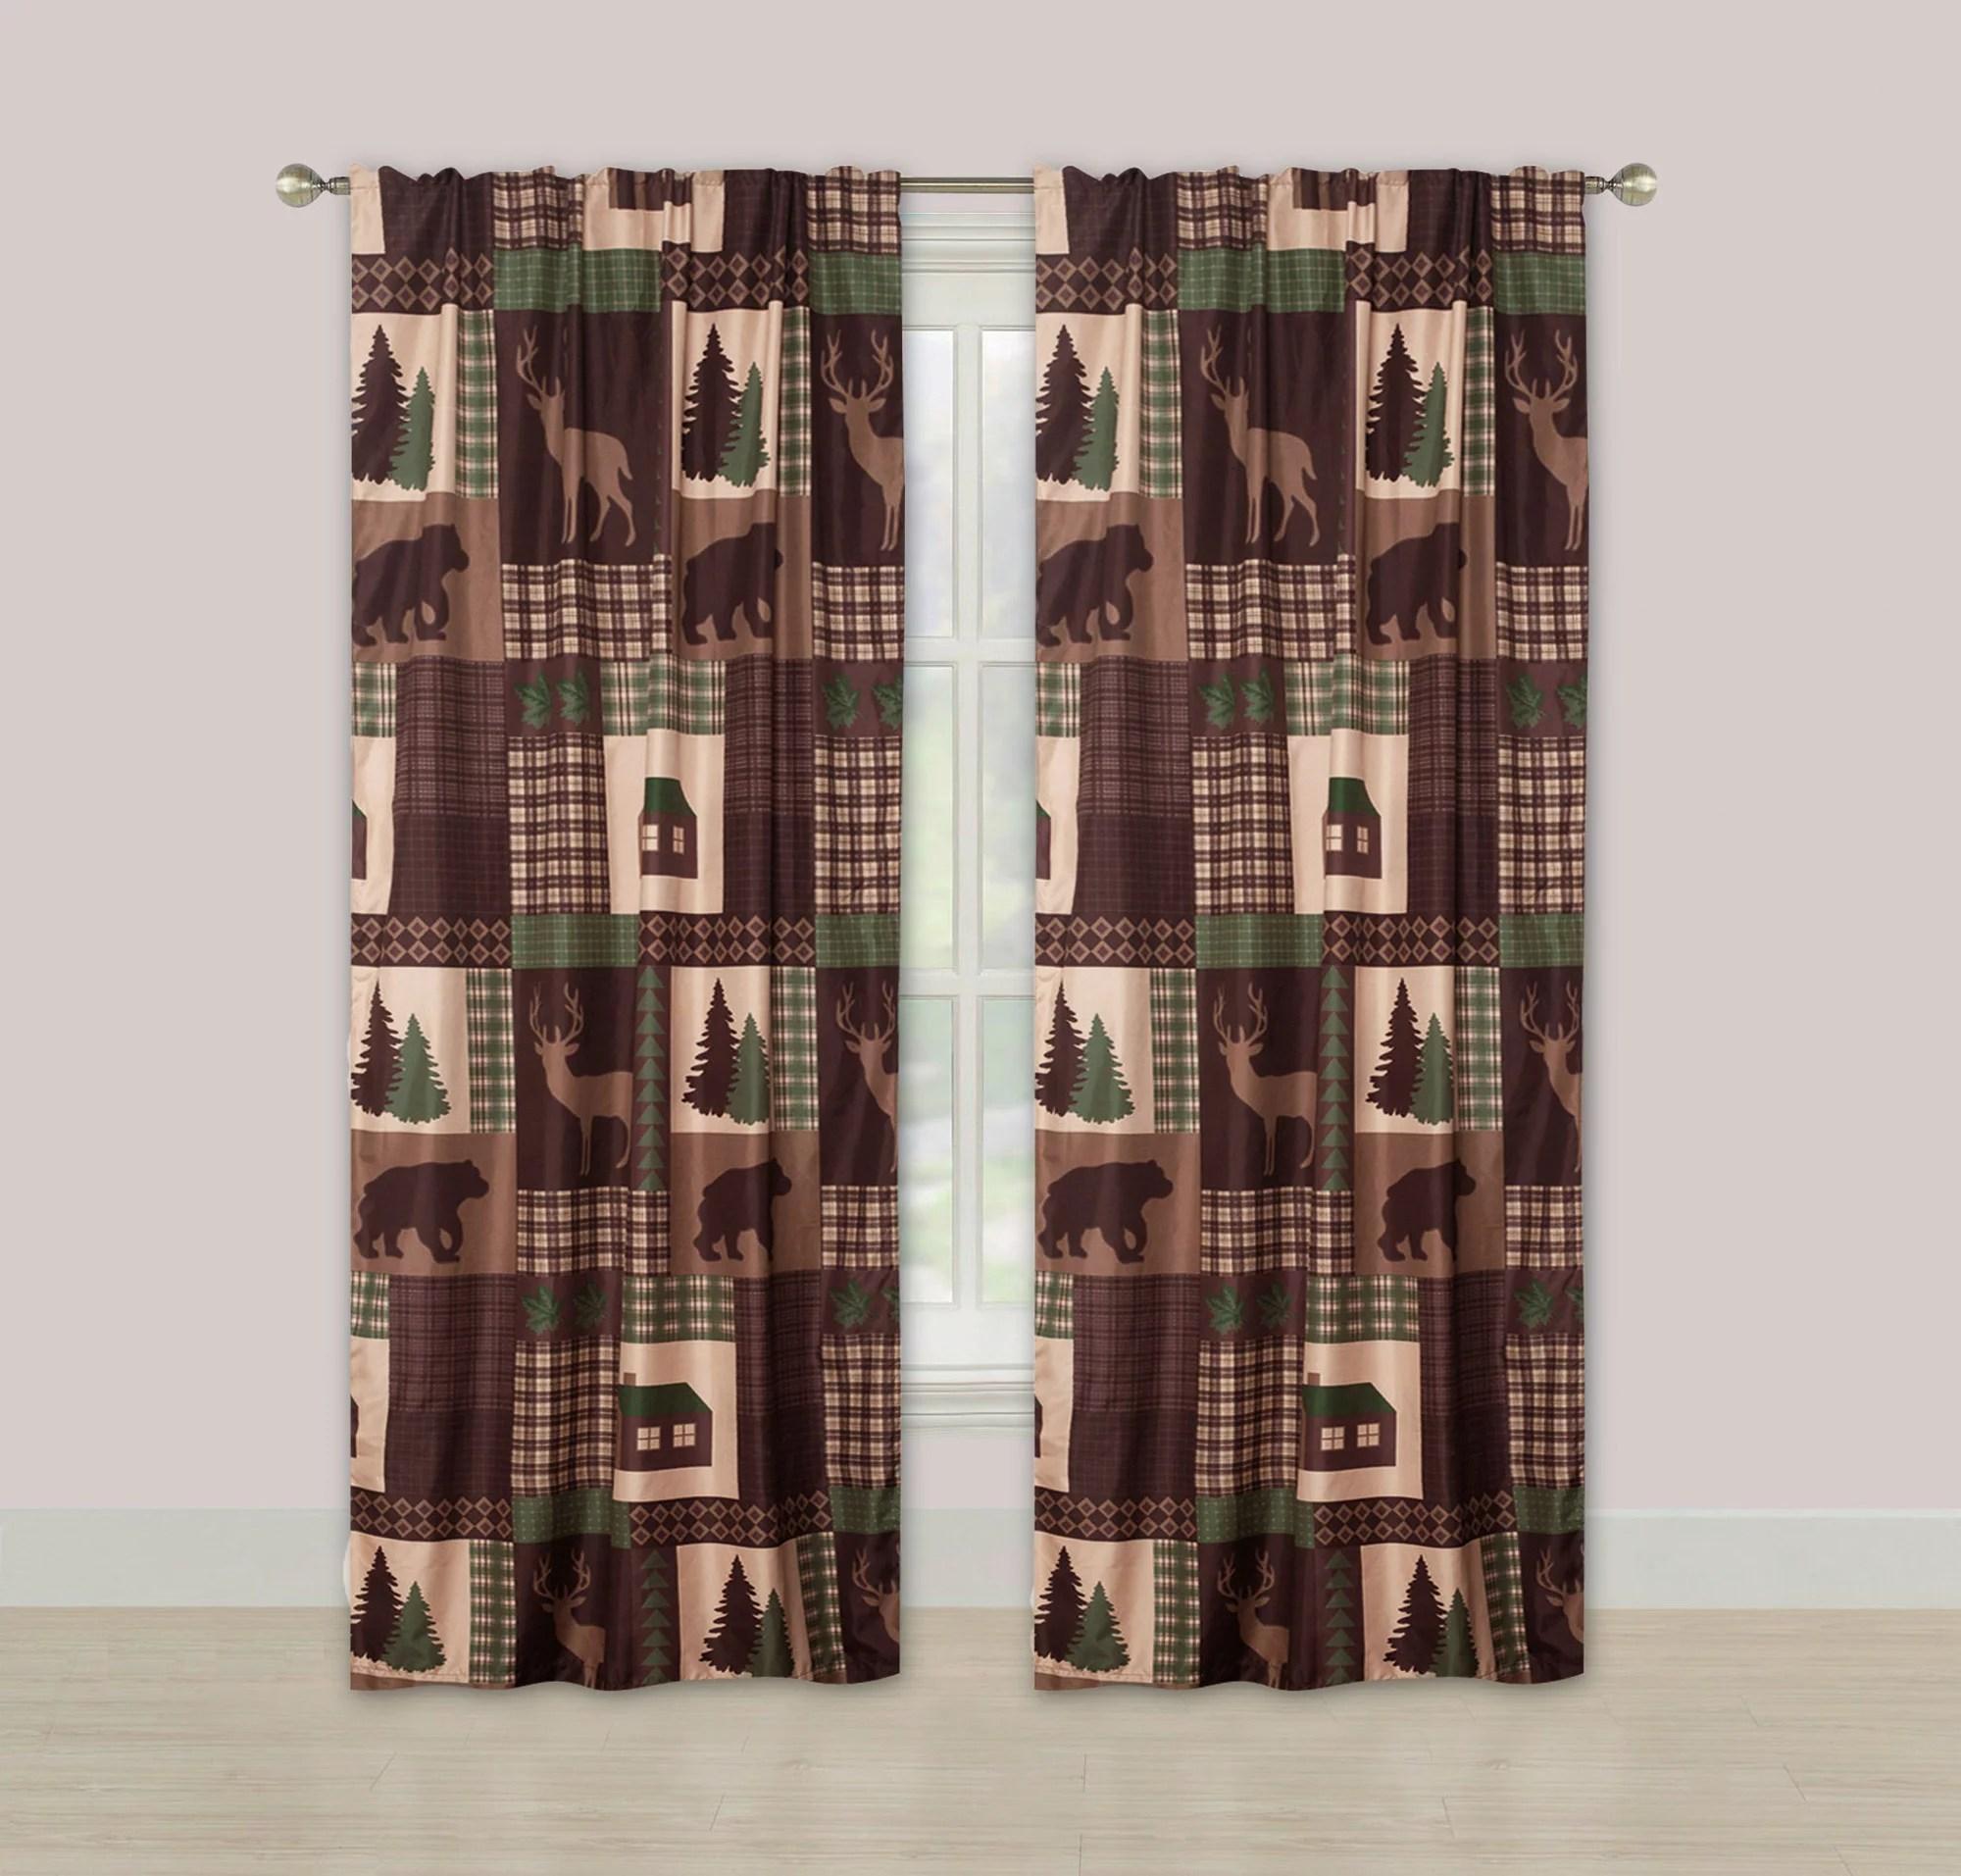 rustic cabin window curtains panel pair drapes lodge deer and bear 84